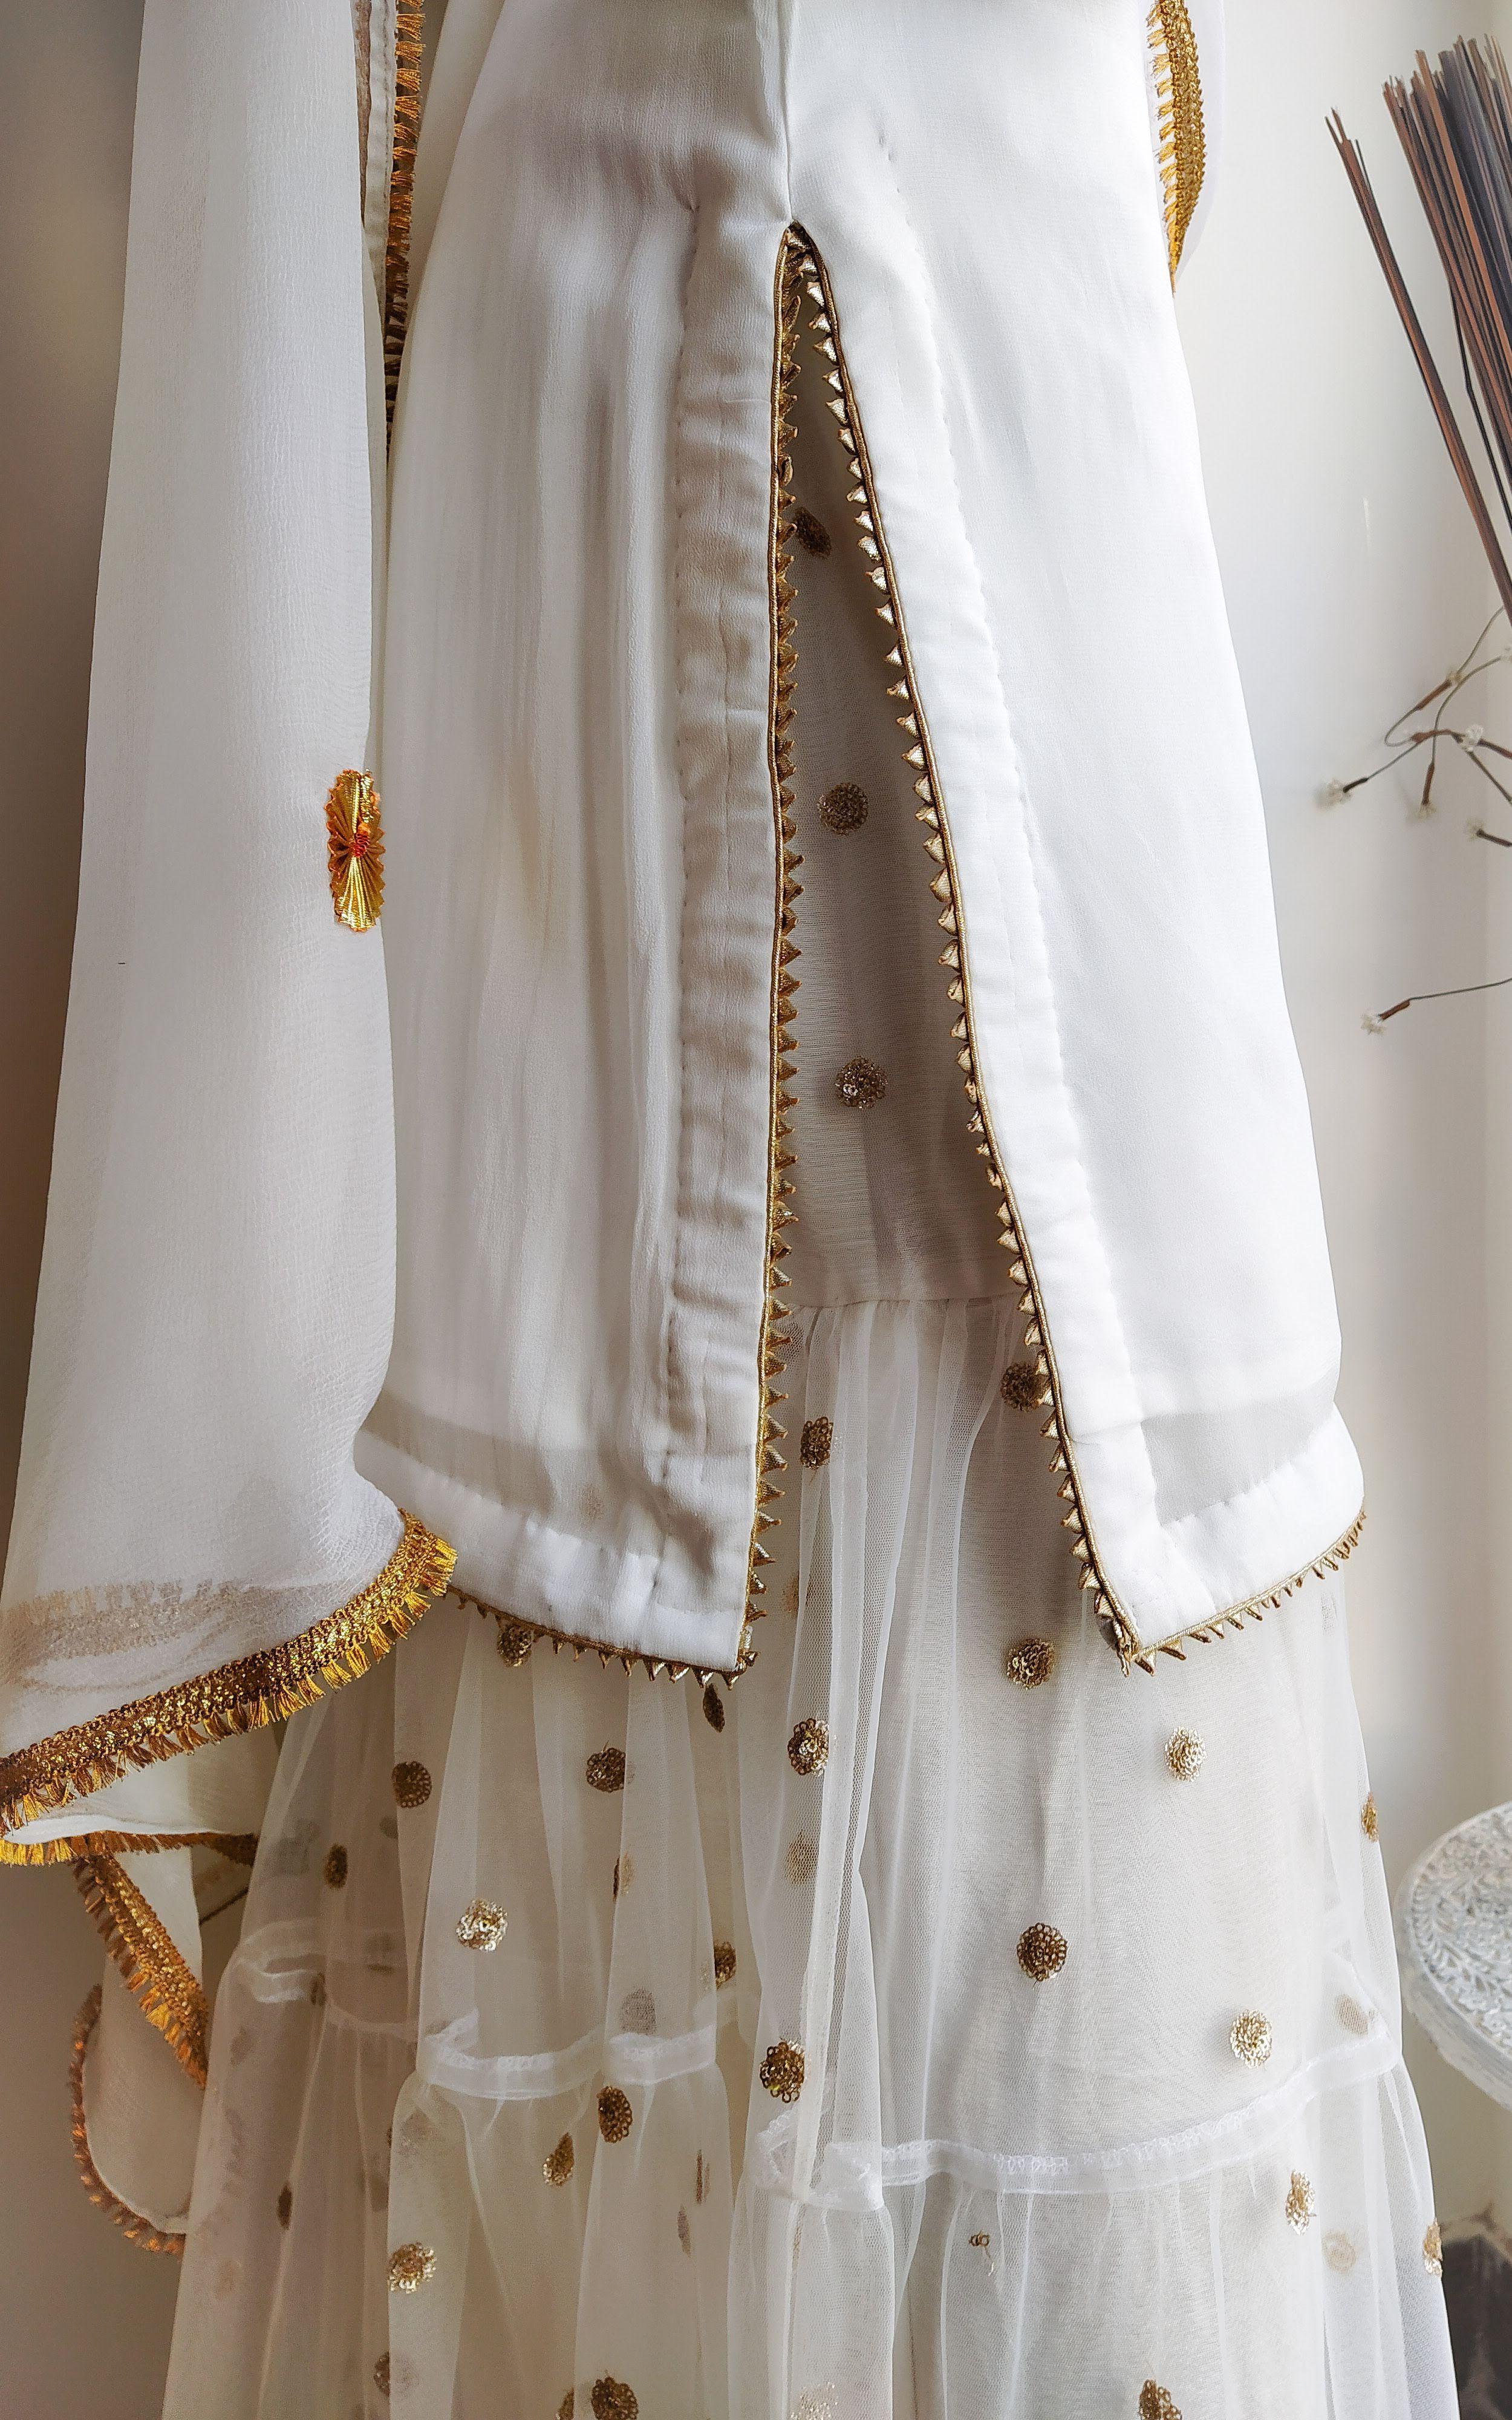 Kurti with gotta on neckline and bottom  # Kurti sleeves with gota flowers and gota lace  sharara with gota lace